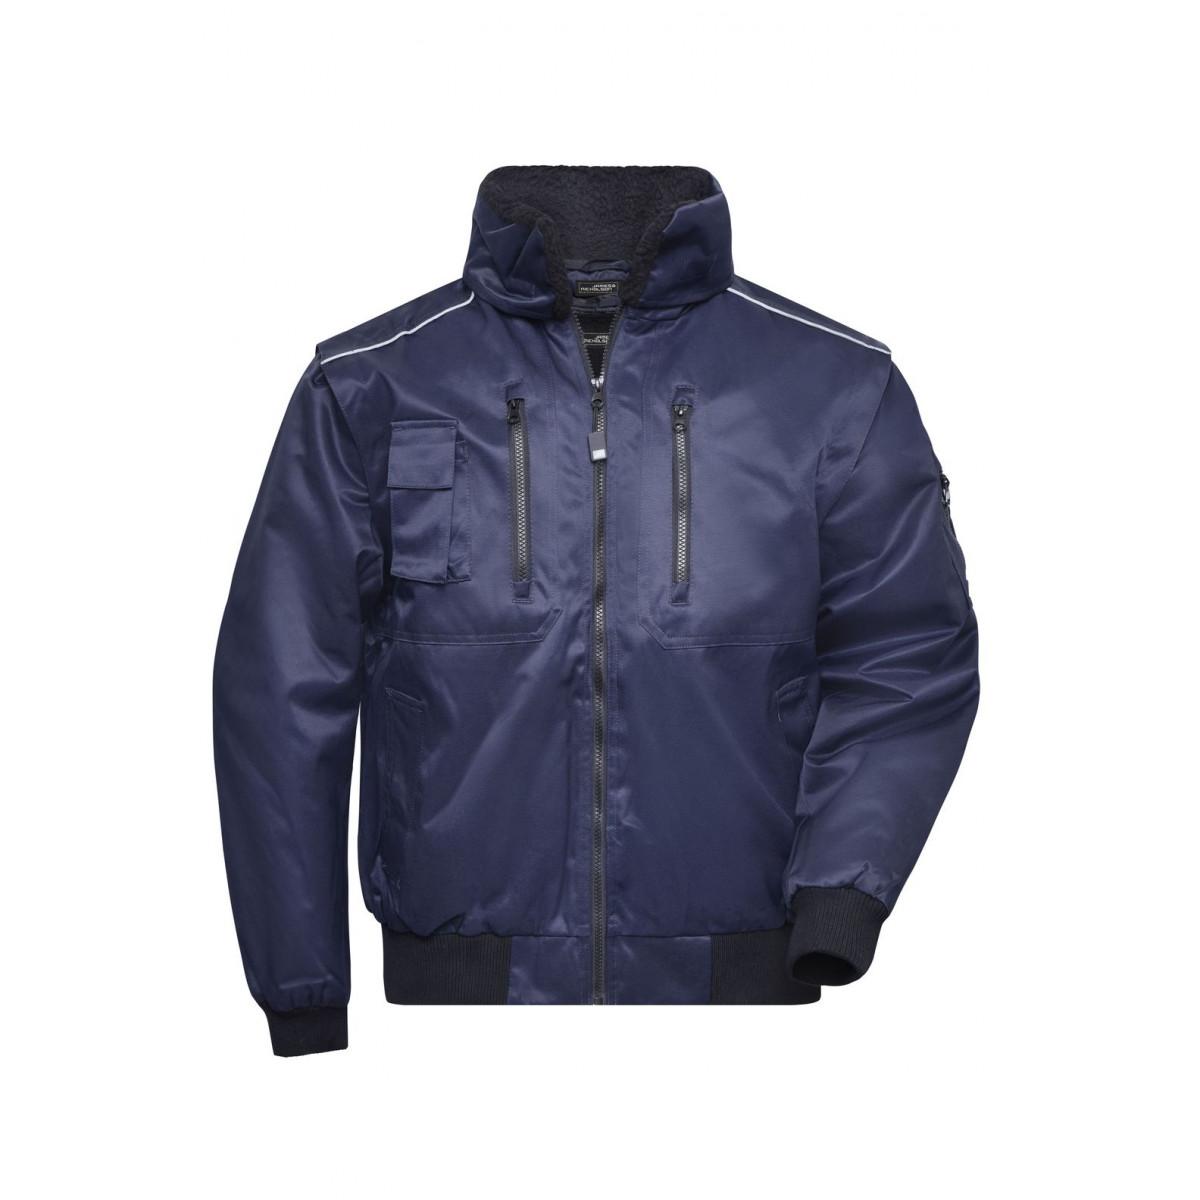 Куртка мужская JN812 Pilot Jacket 3 in 1 - Темно-синий